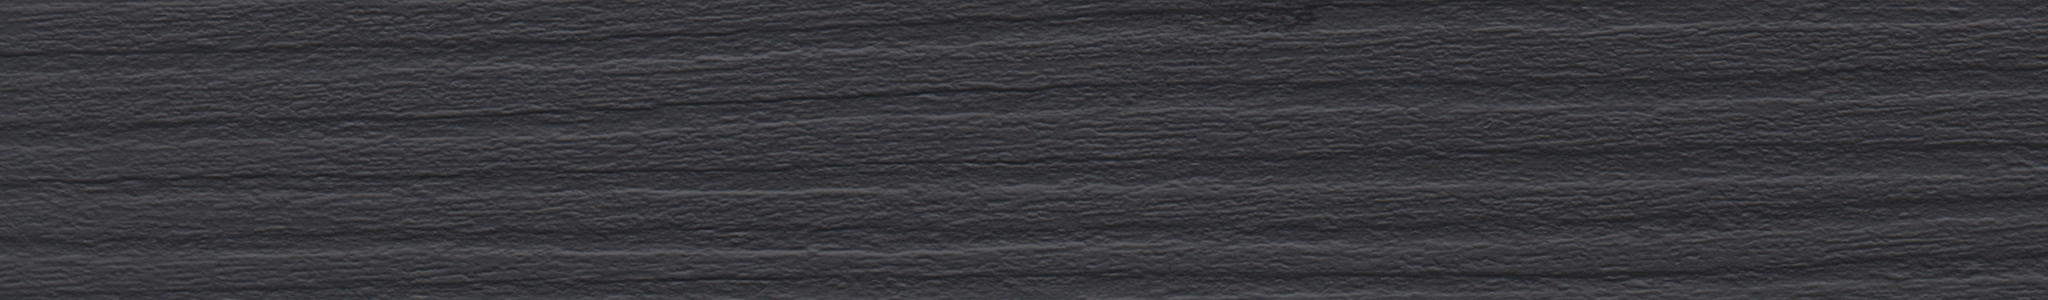 HU 193031 ABS Edge Black Pore XC